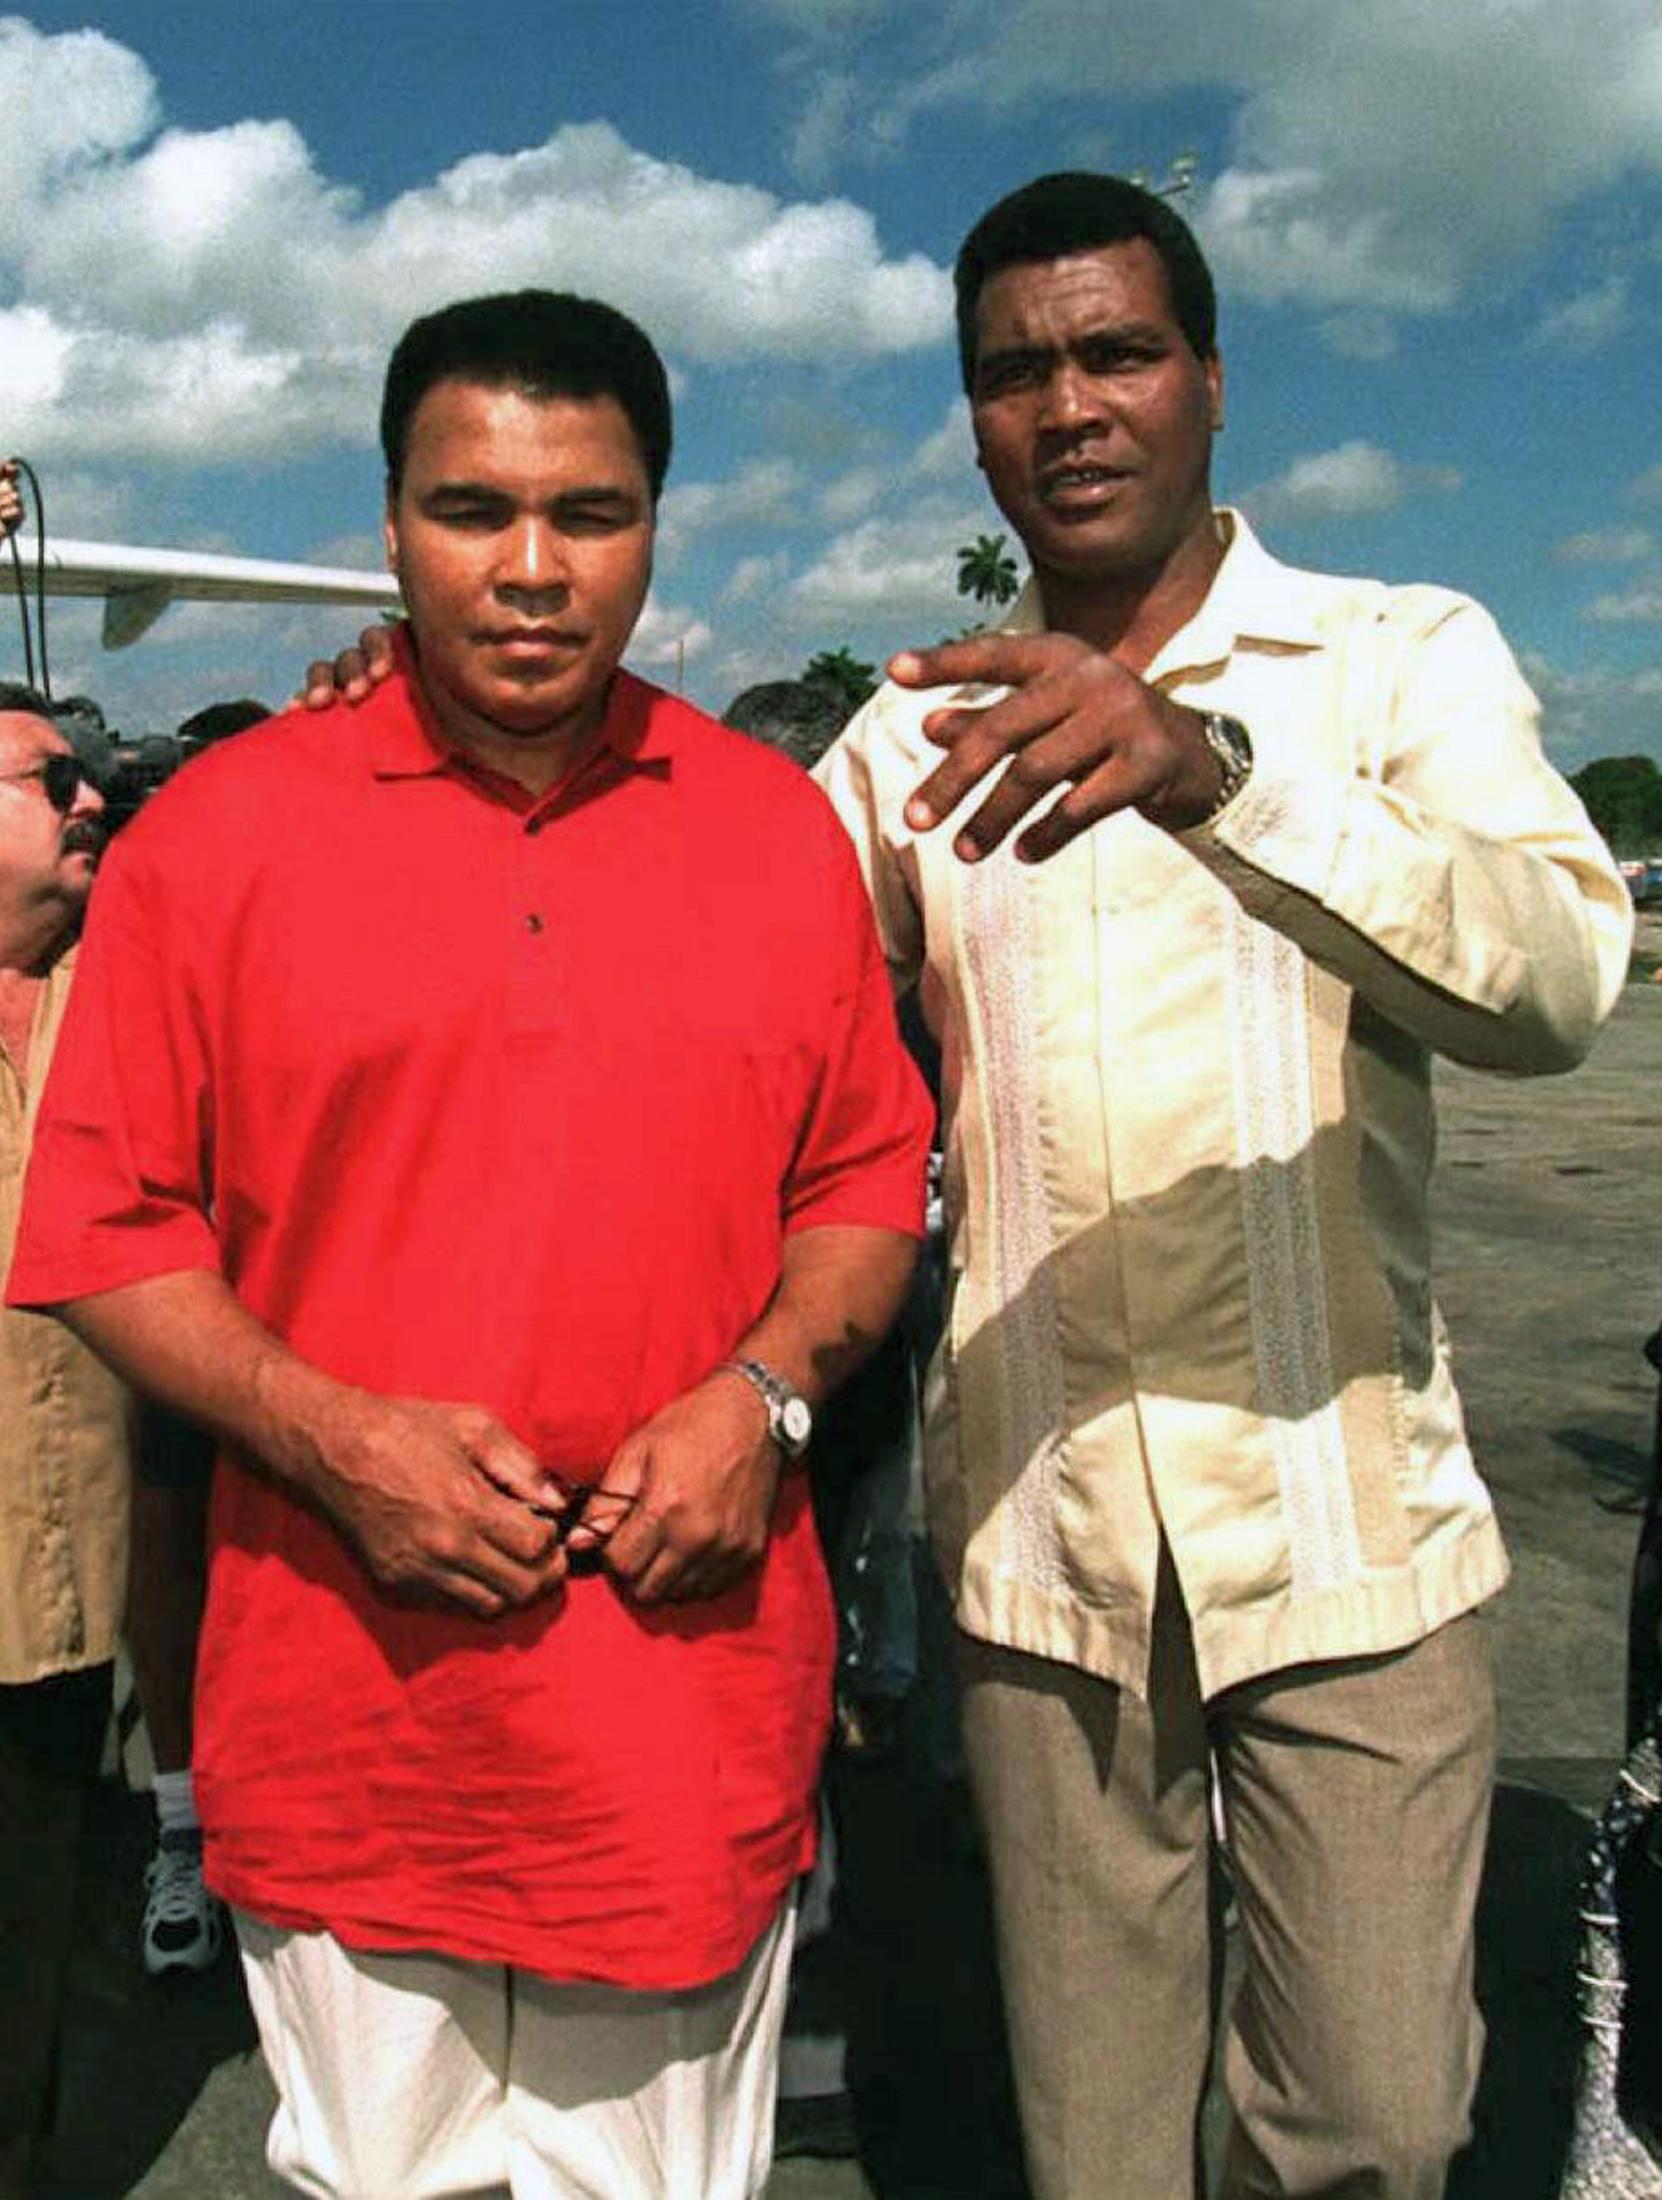 Former Cuban boxer Teofilo Stevenson (R)